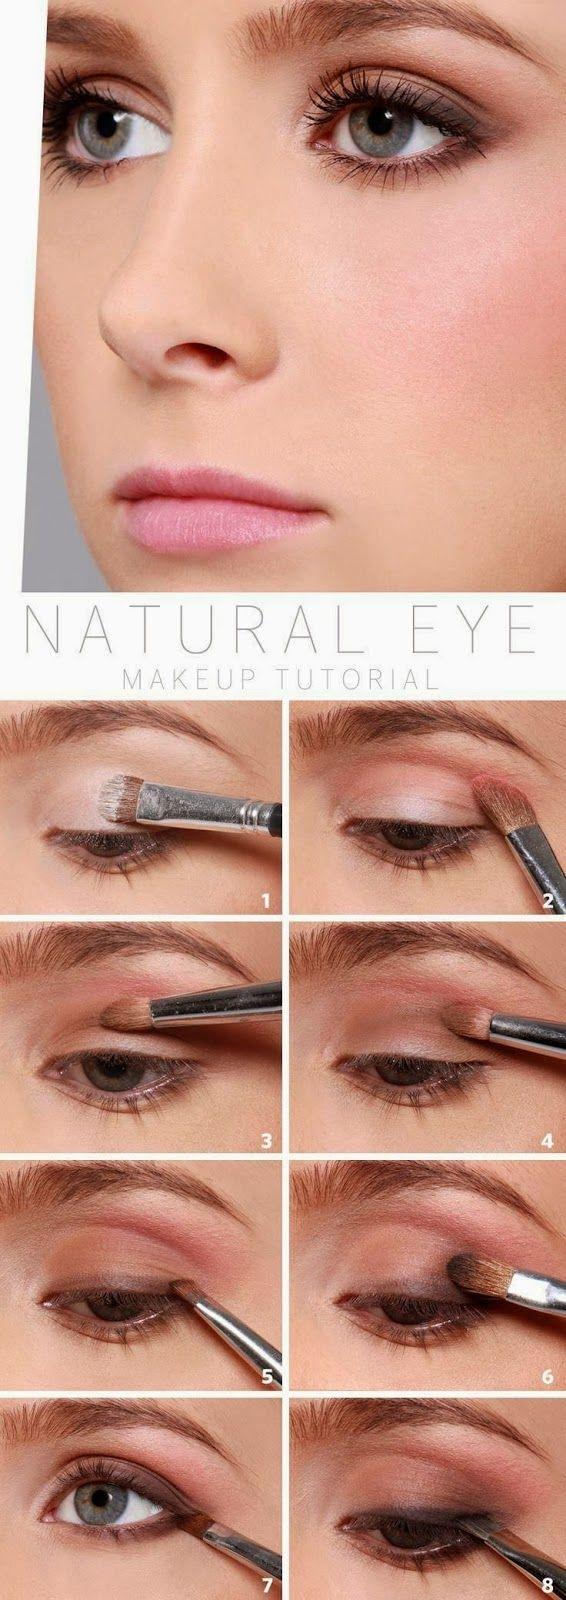 How-To: Natural Eye Makeup Tutorial homecoming